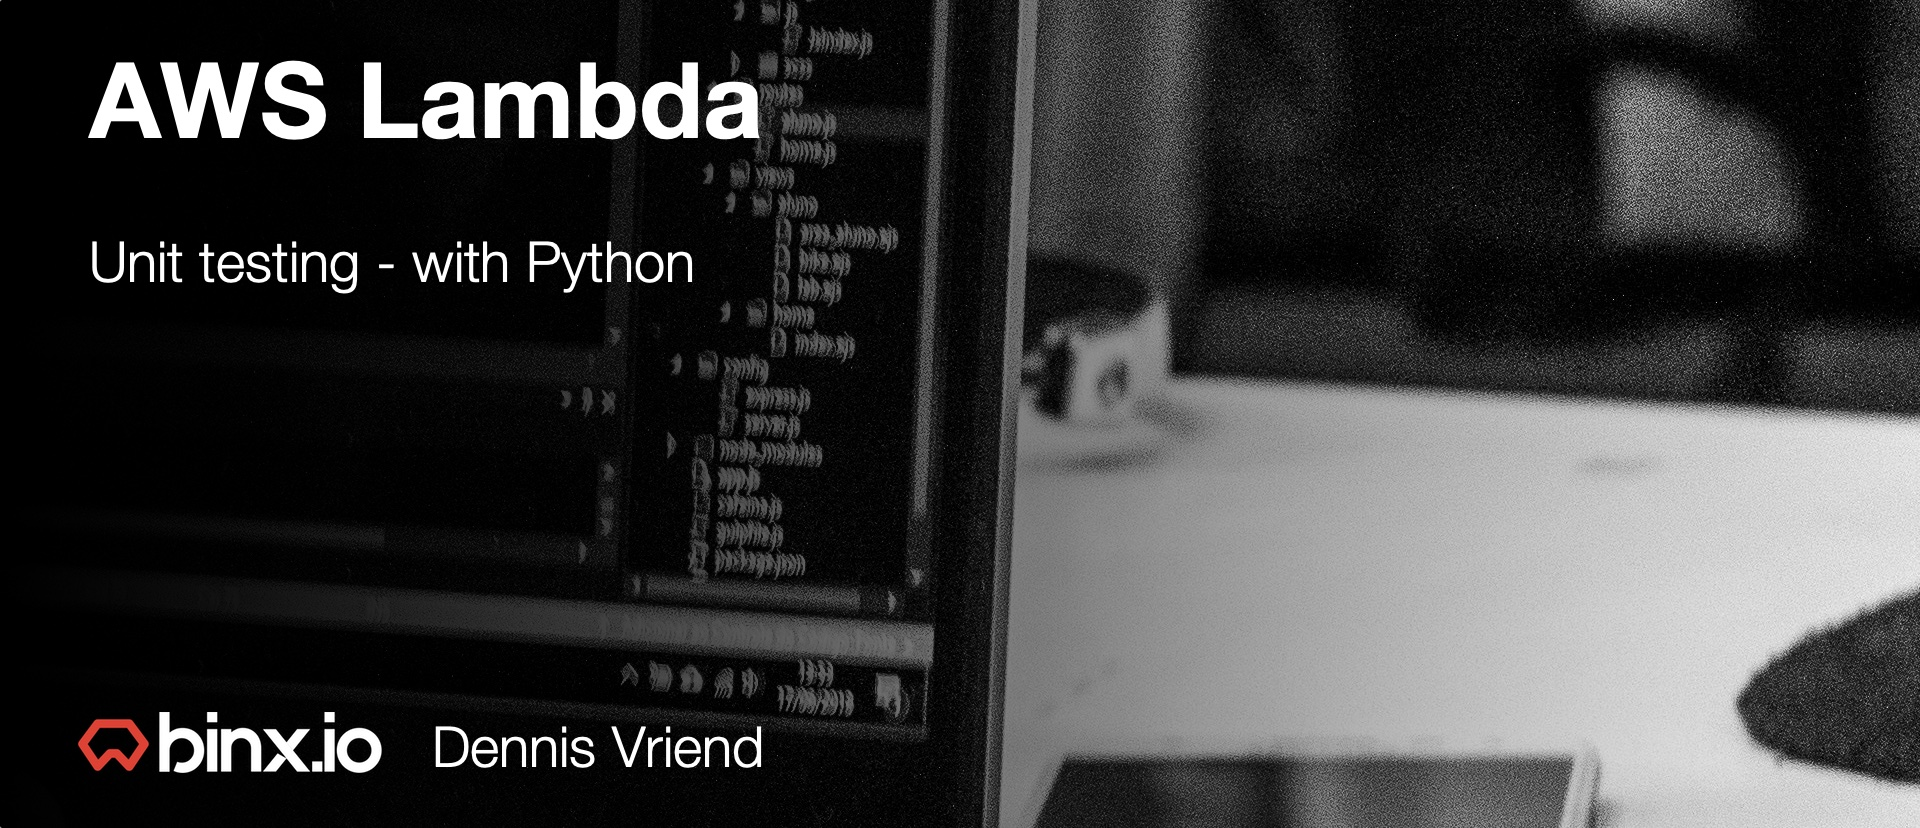 AWS Lambda unit testing with Python